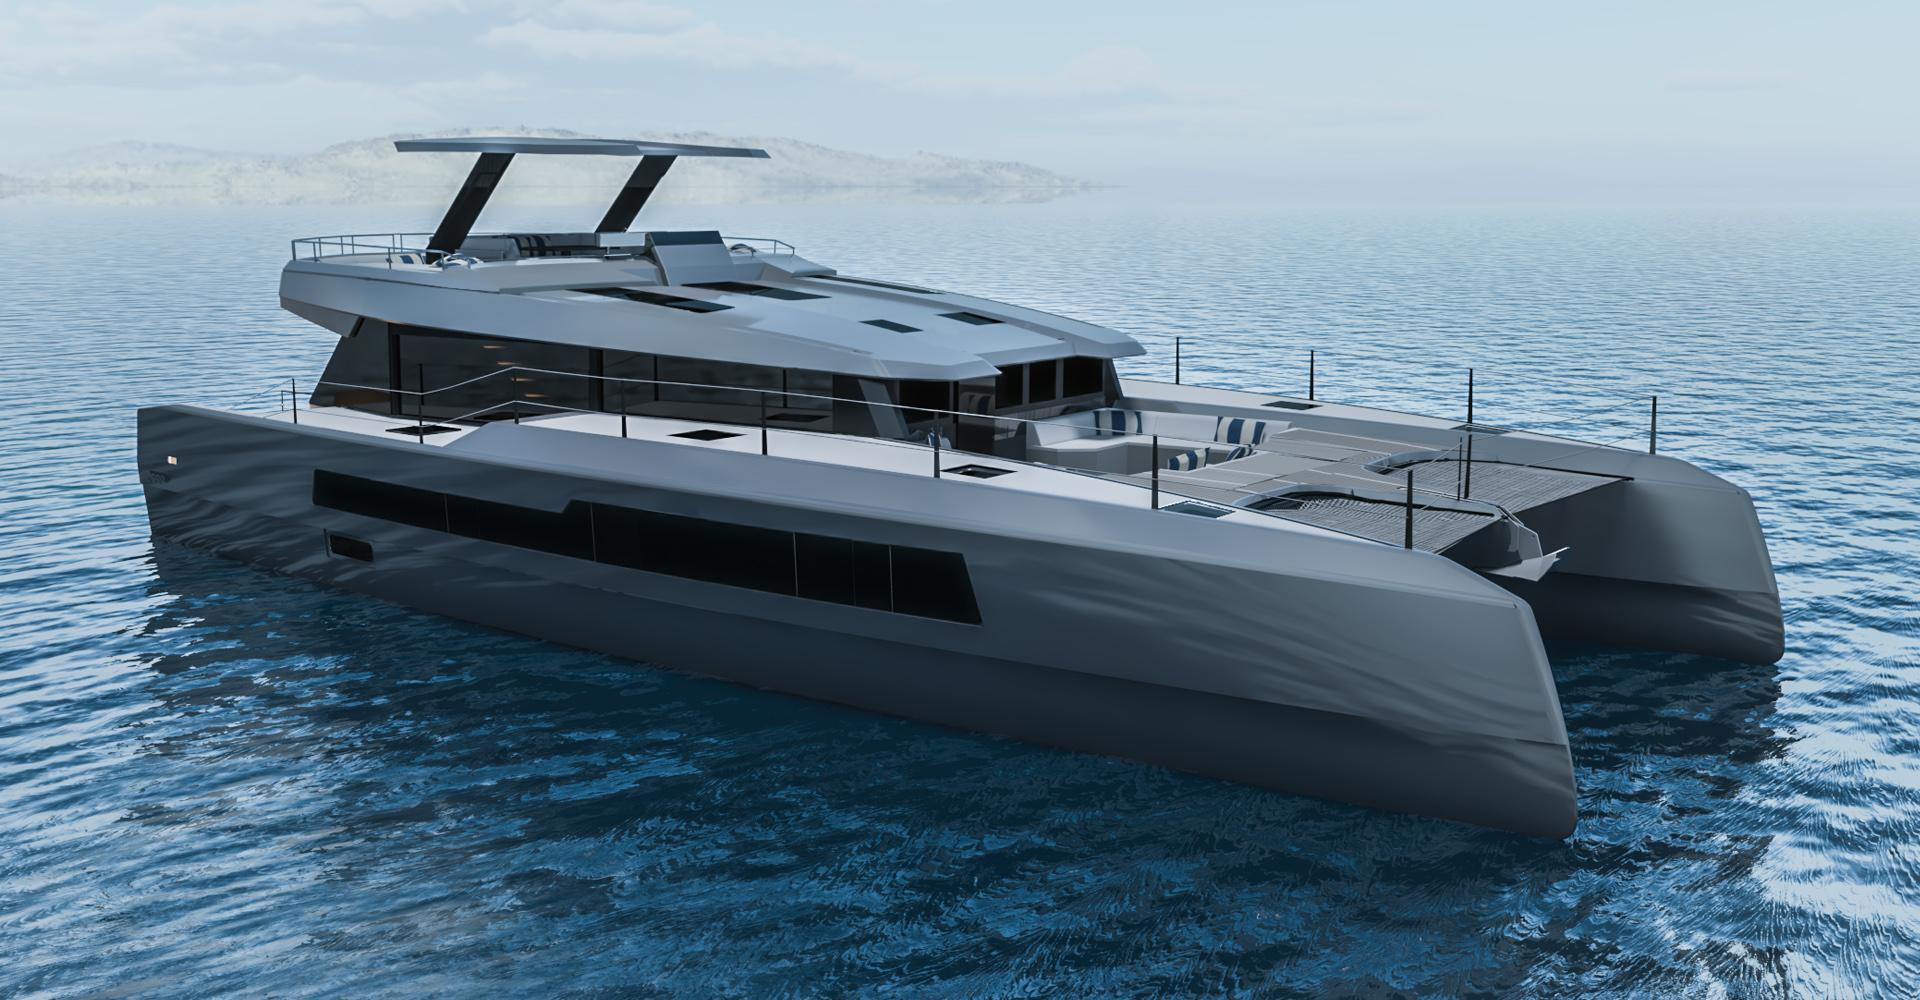 The McConaghy MC59p is a power catamaran